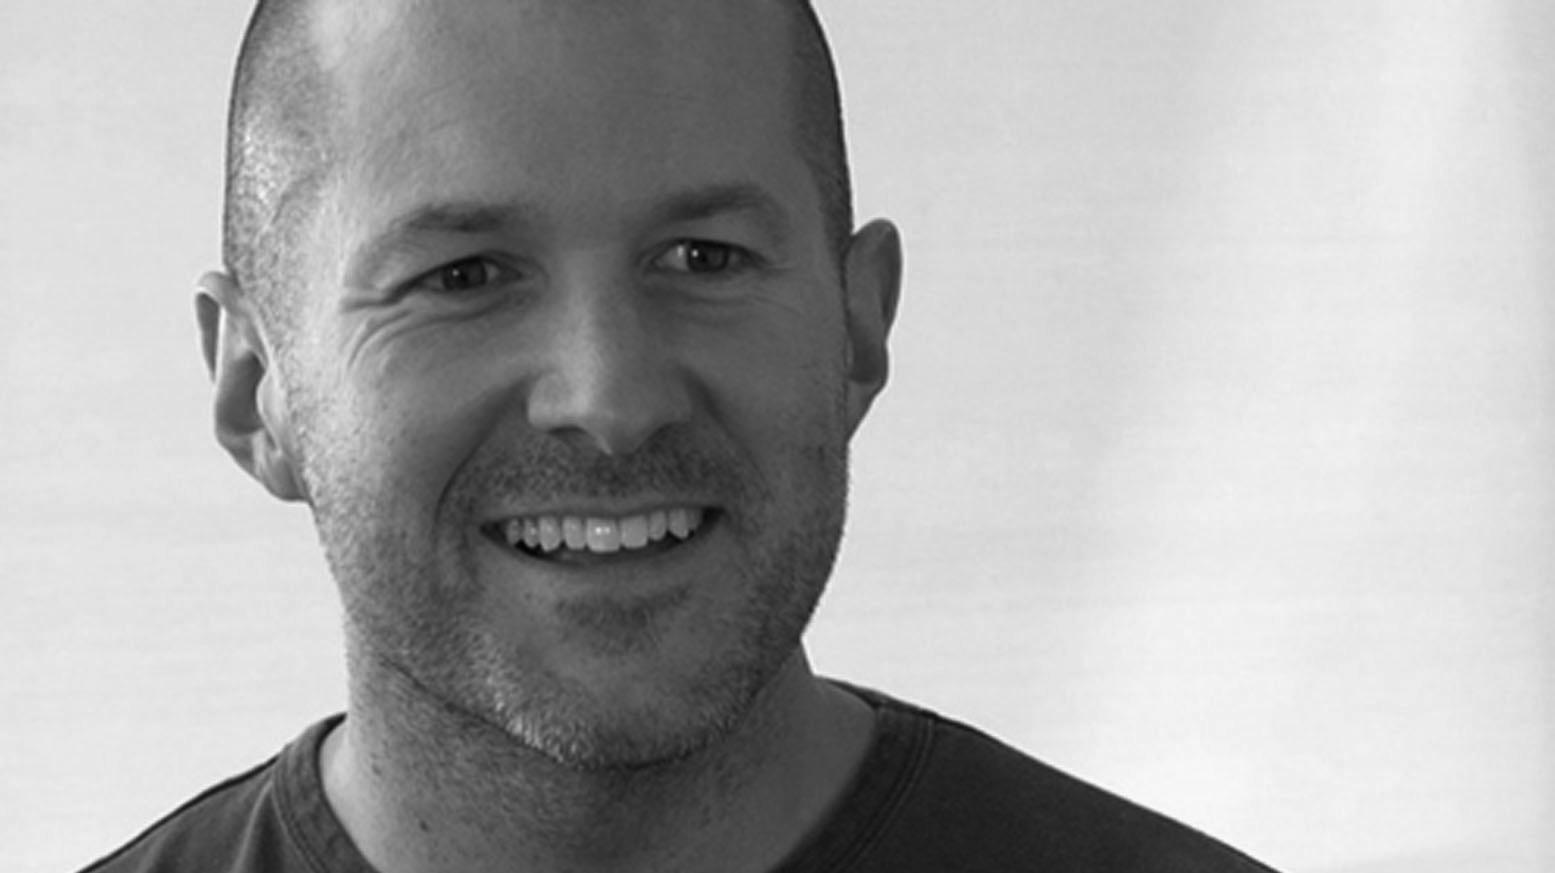 Apple design guru Jony Ive discusses the iPad Pro's Pencil